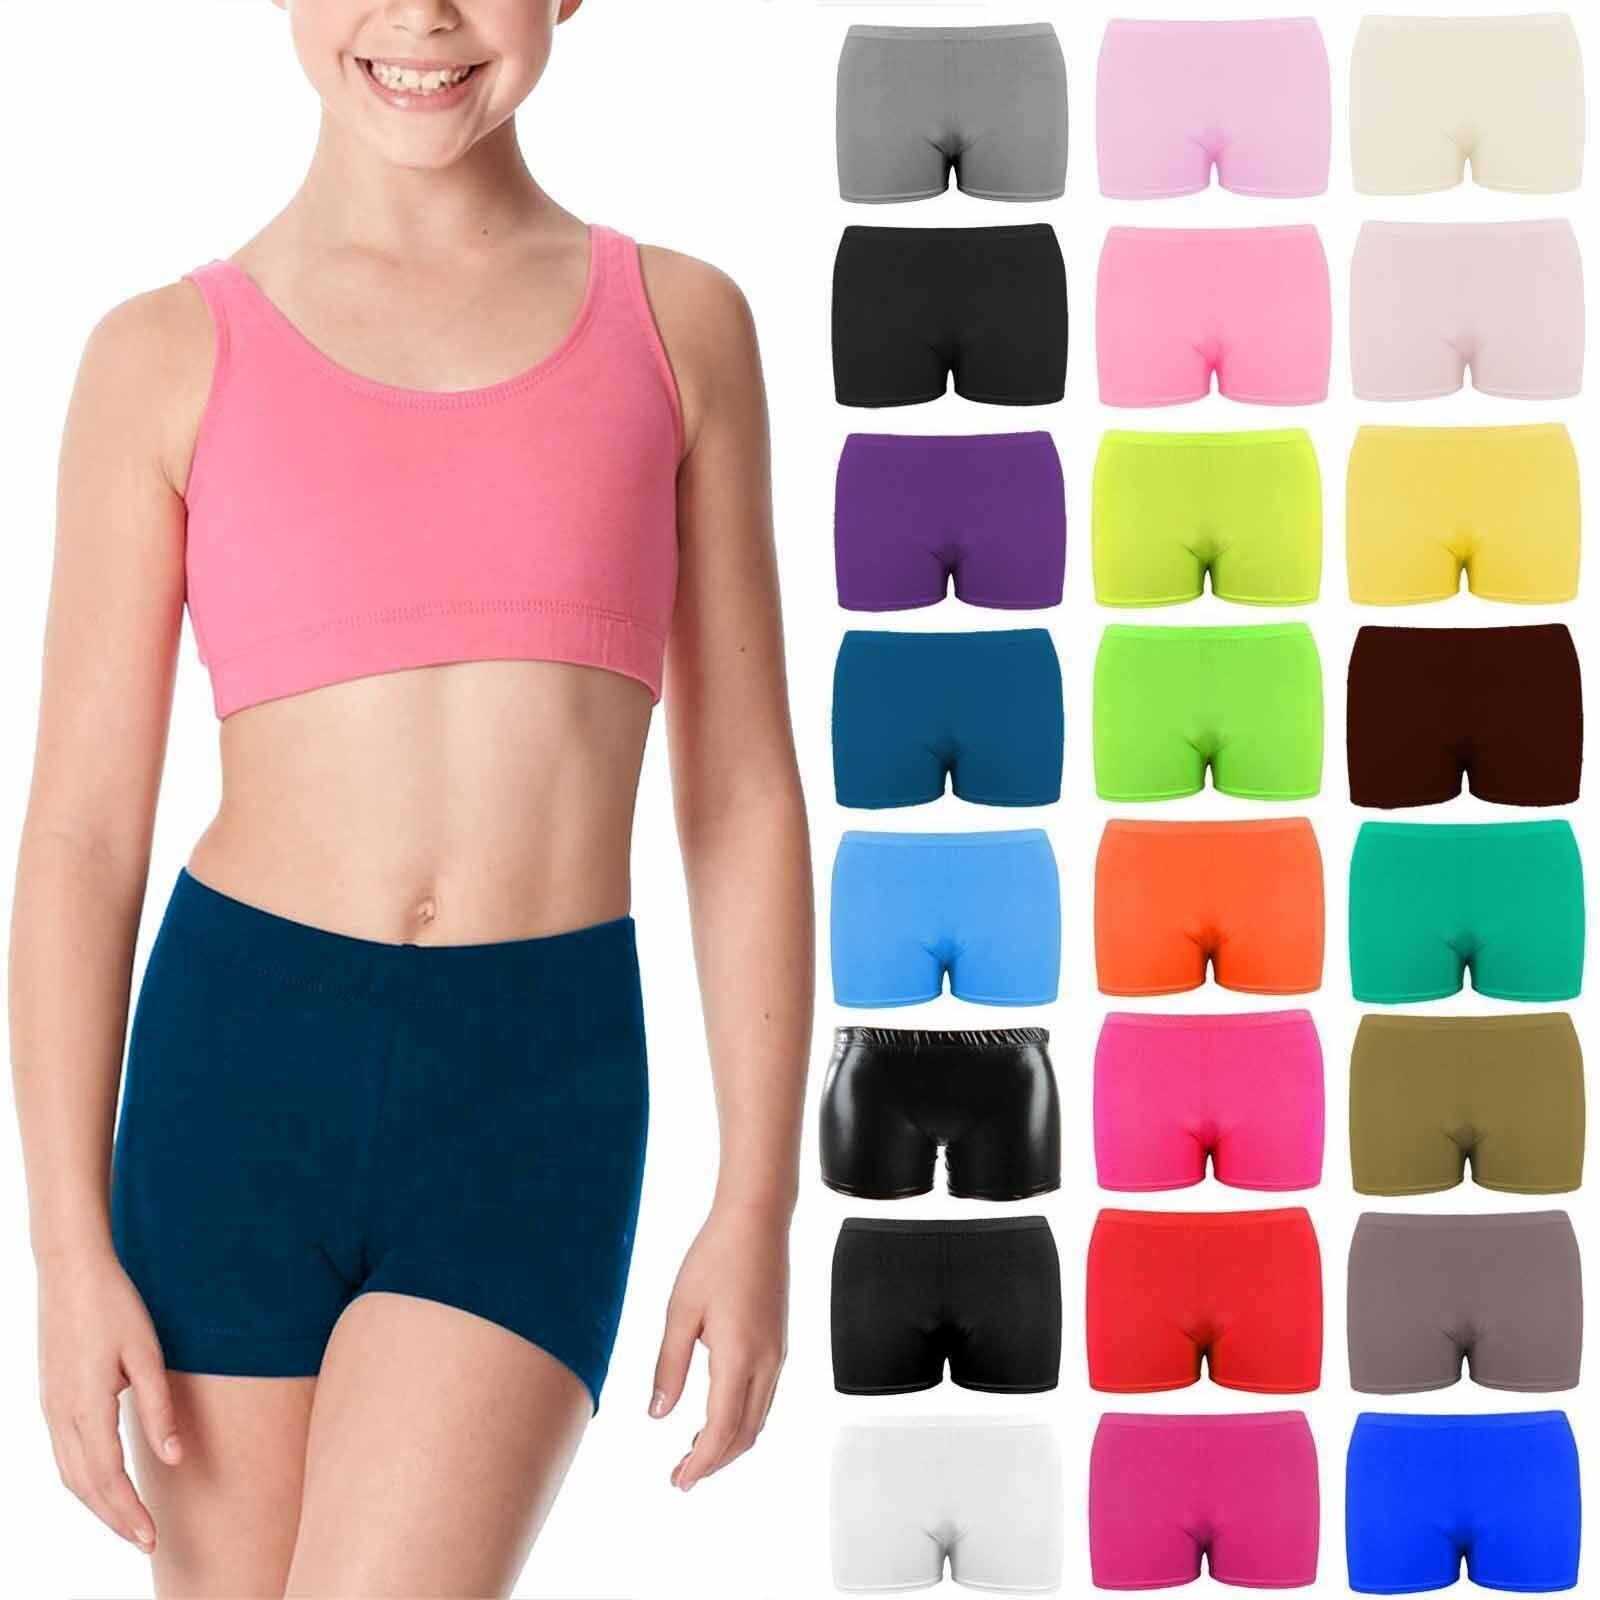 Girls Microfiber Hot Pants Shorts School Dance Gym Lycra Stretch Shorts Age 3-13